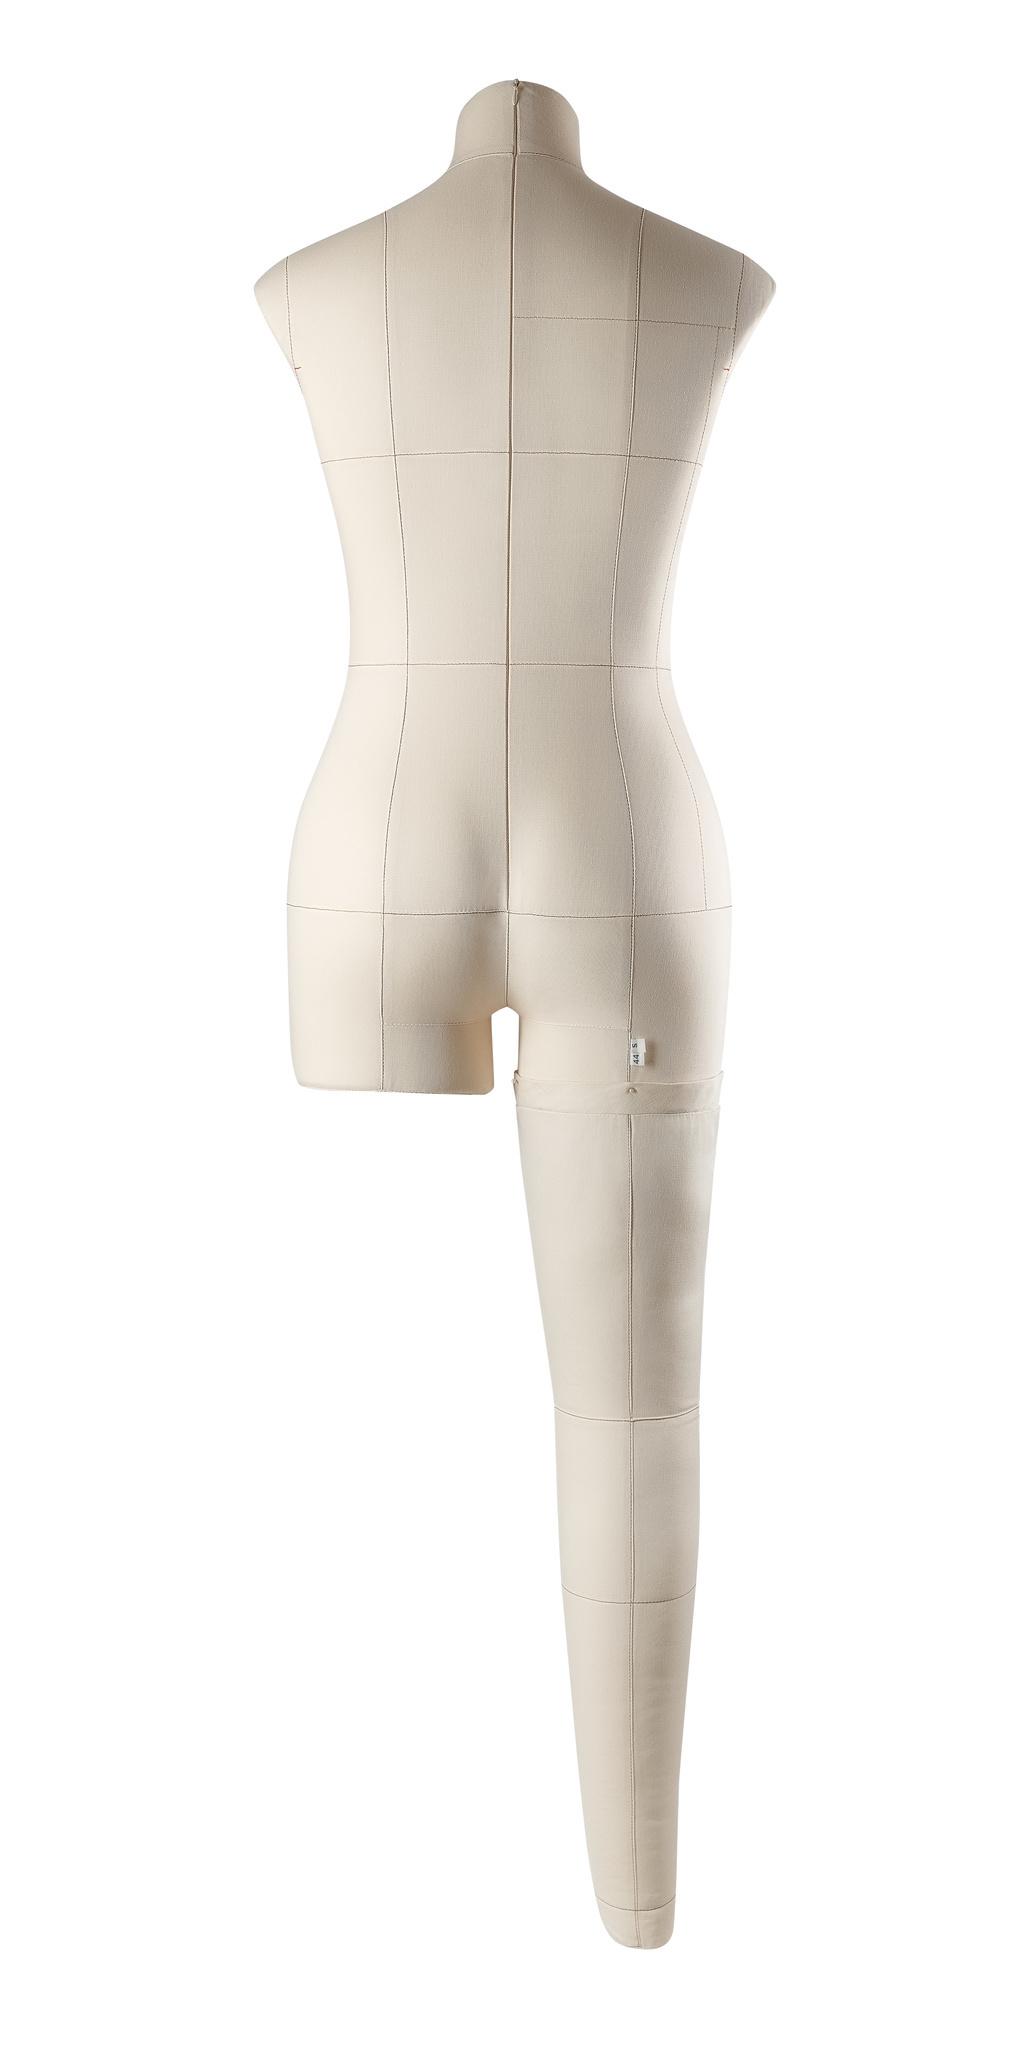 Нога для манекена Моника, размер 44 тип фигуры Прямоугольник, бежеваяФото 3